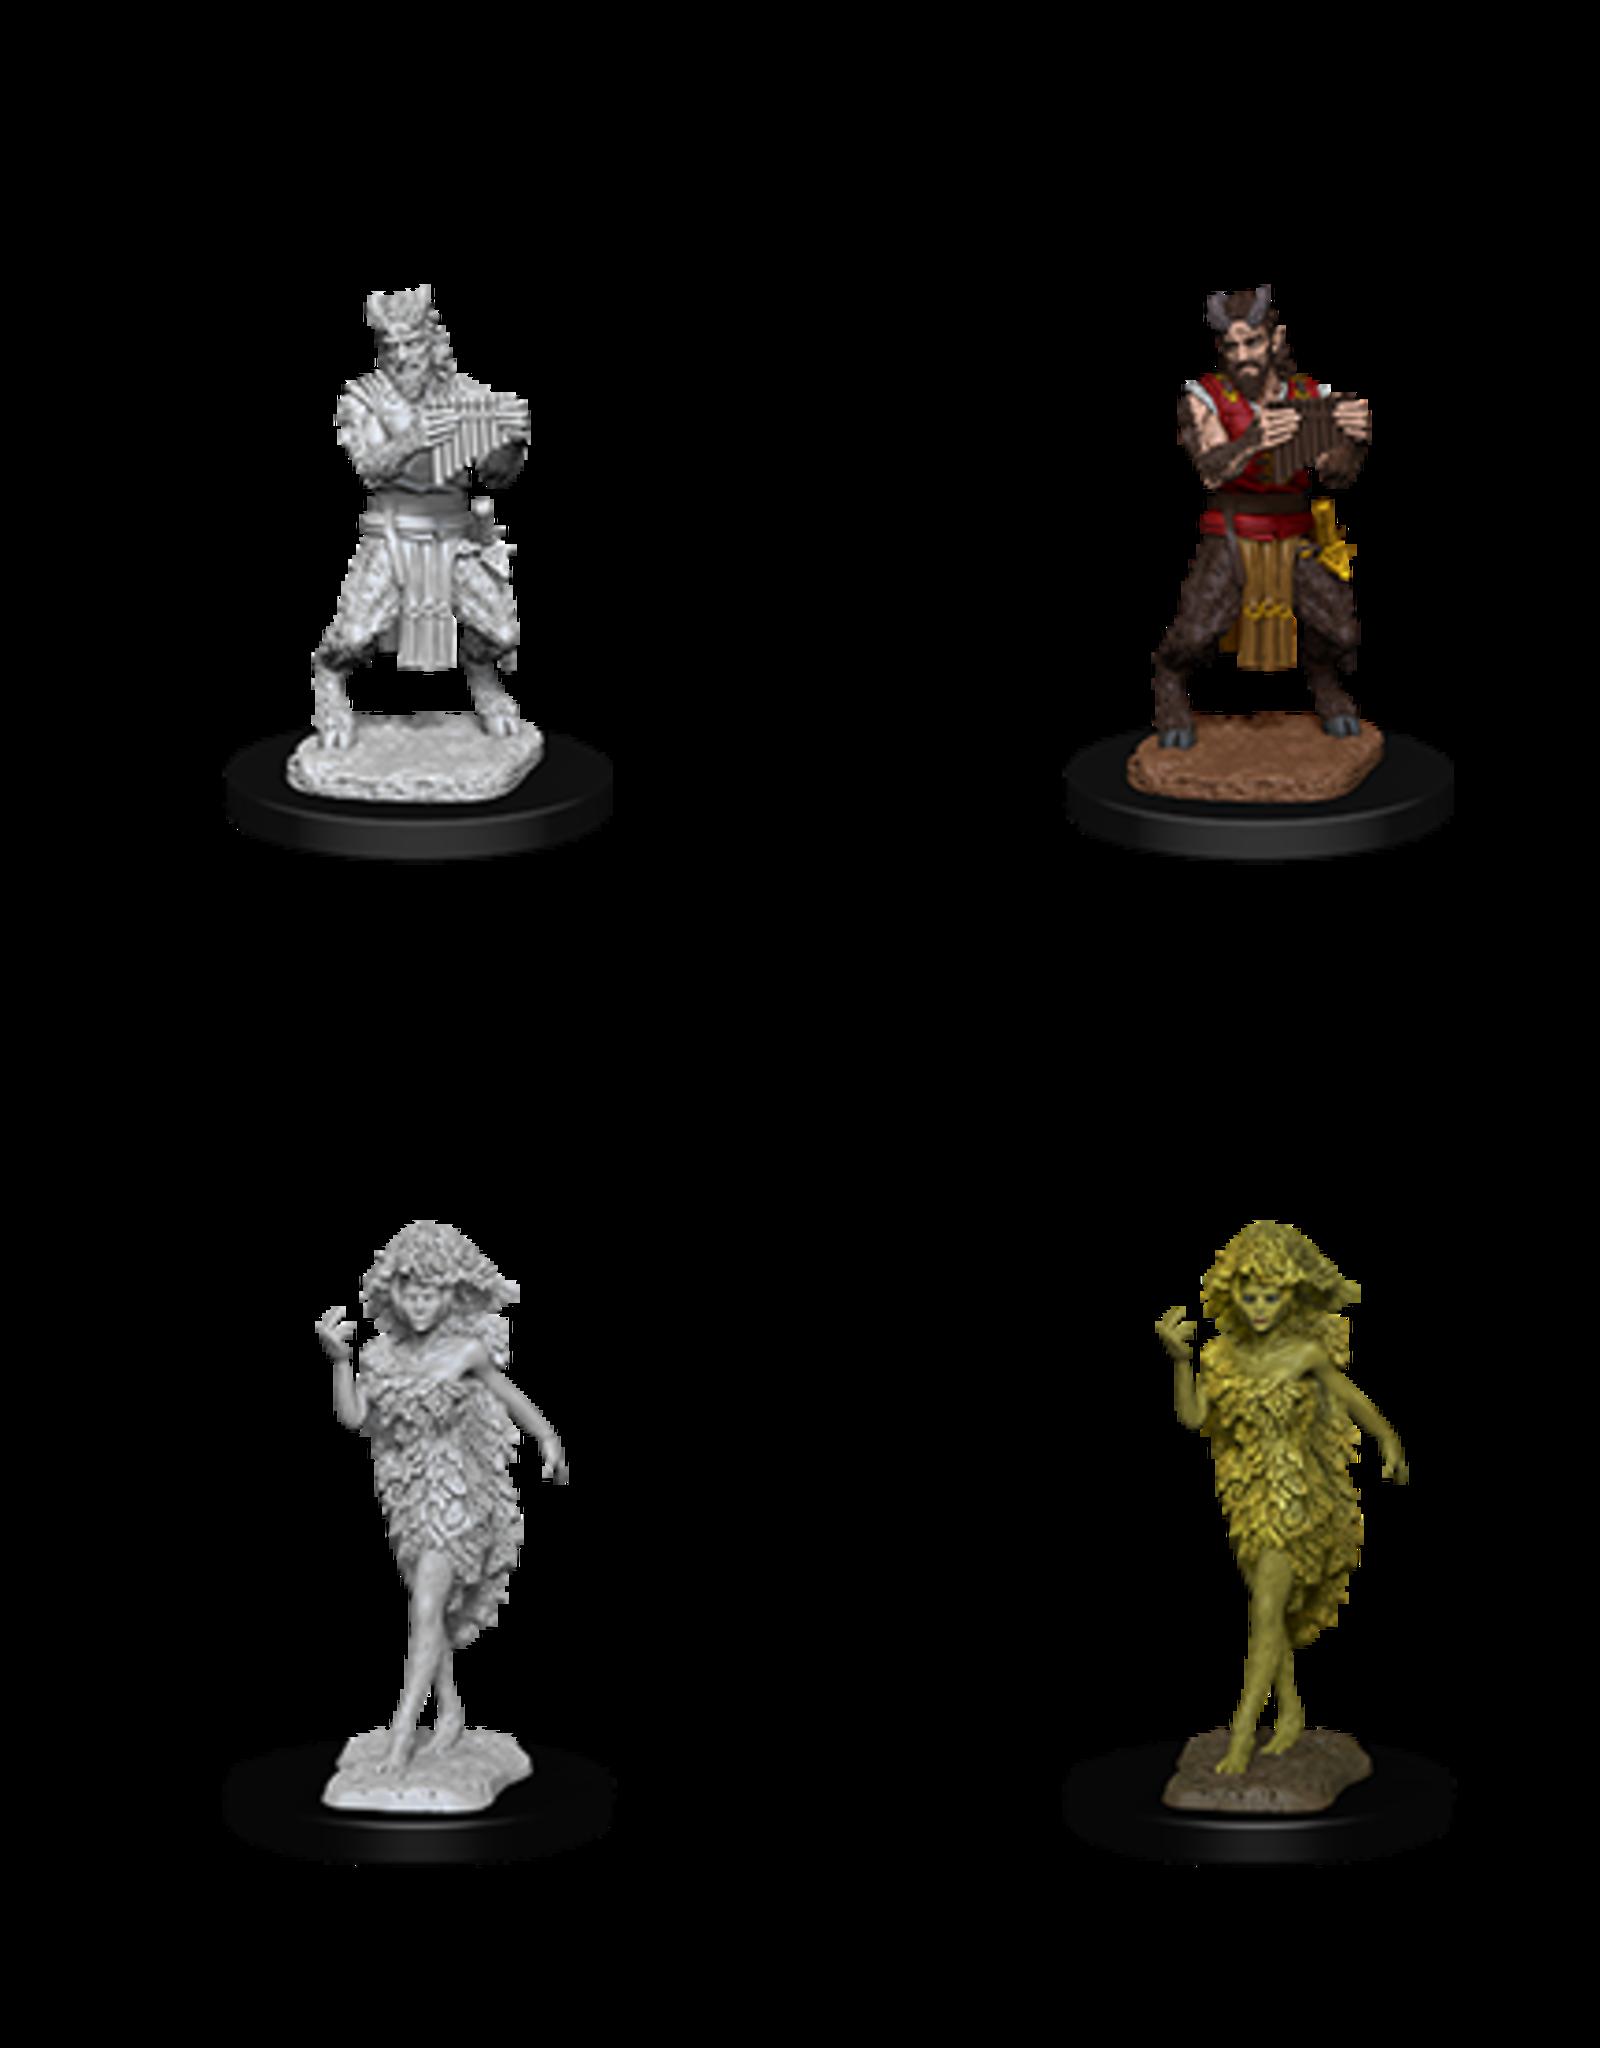 Nolzur's Marvelous Miniatures D&D NMU: Satyr & Dryad (W11)